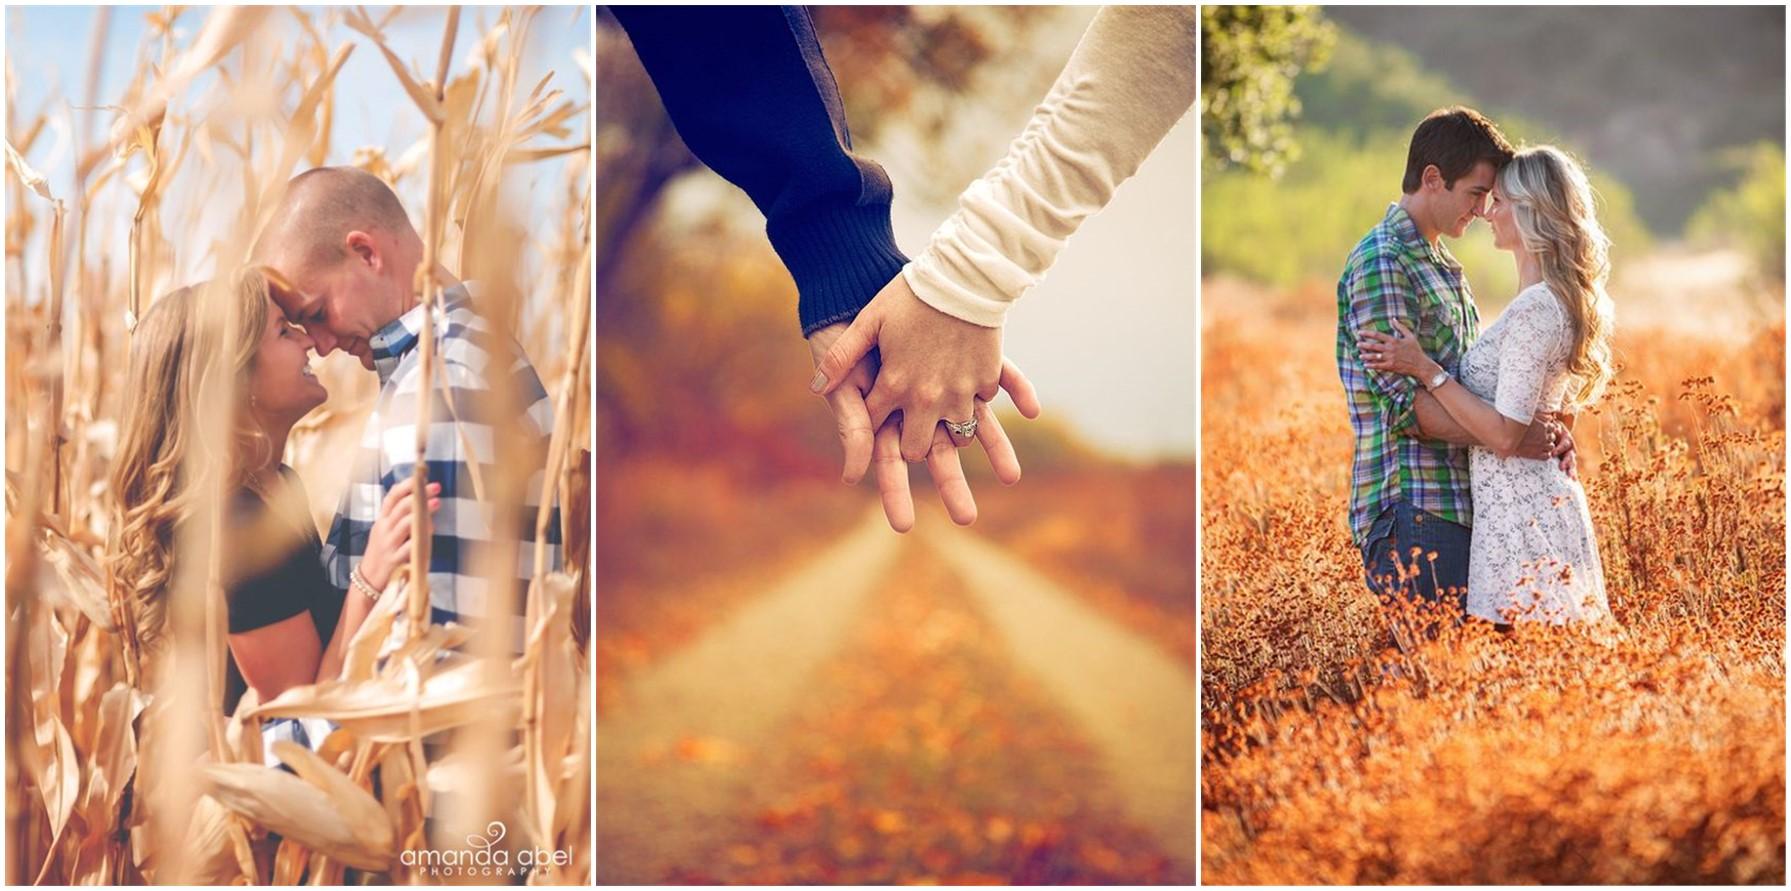 23 Creative Fall Engagement Photo Shoots Ideas I Should Ve